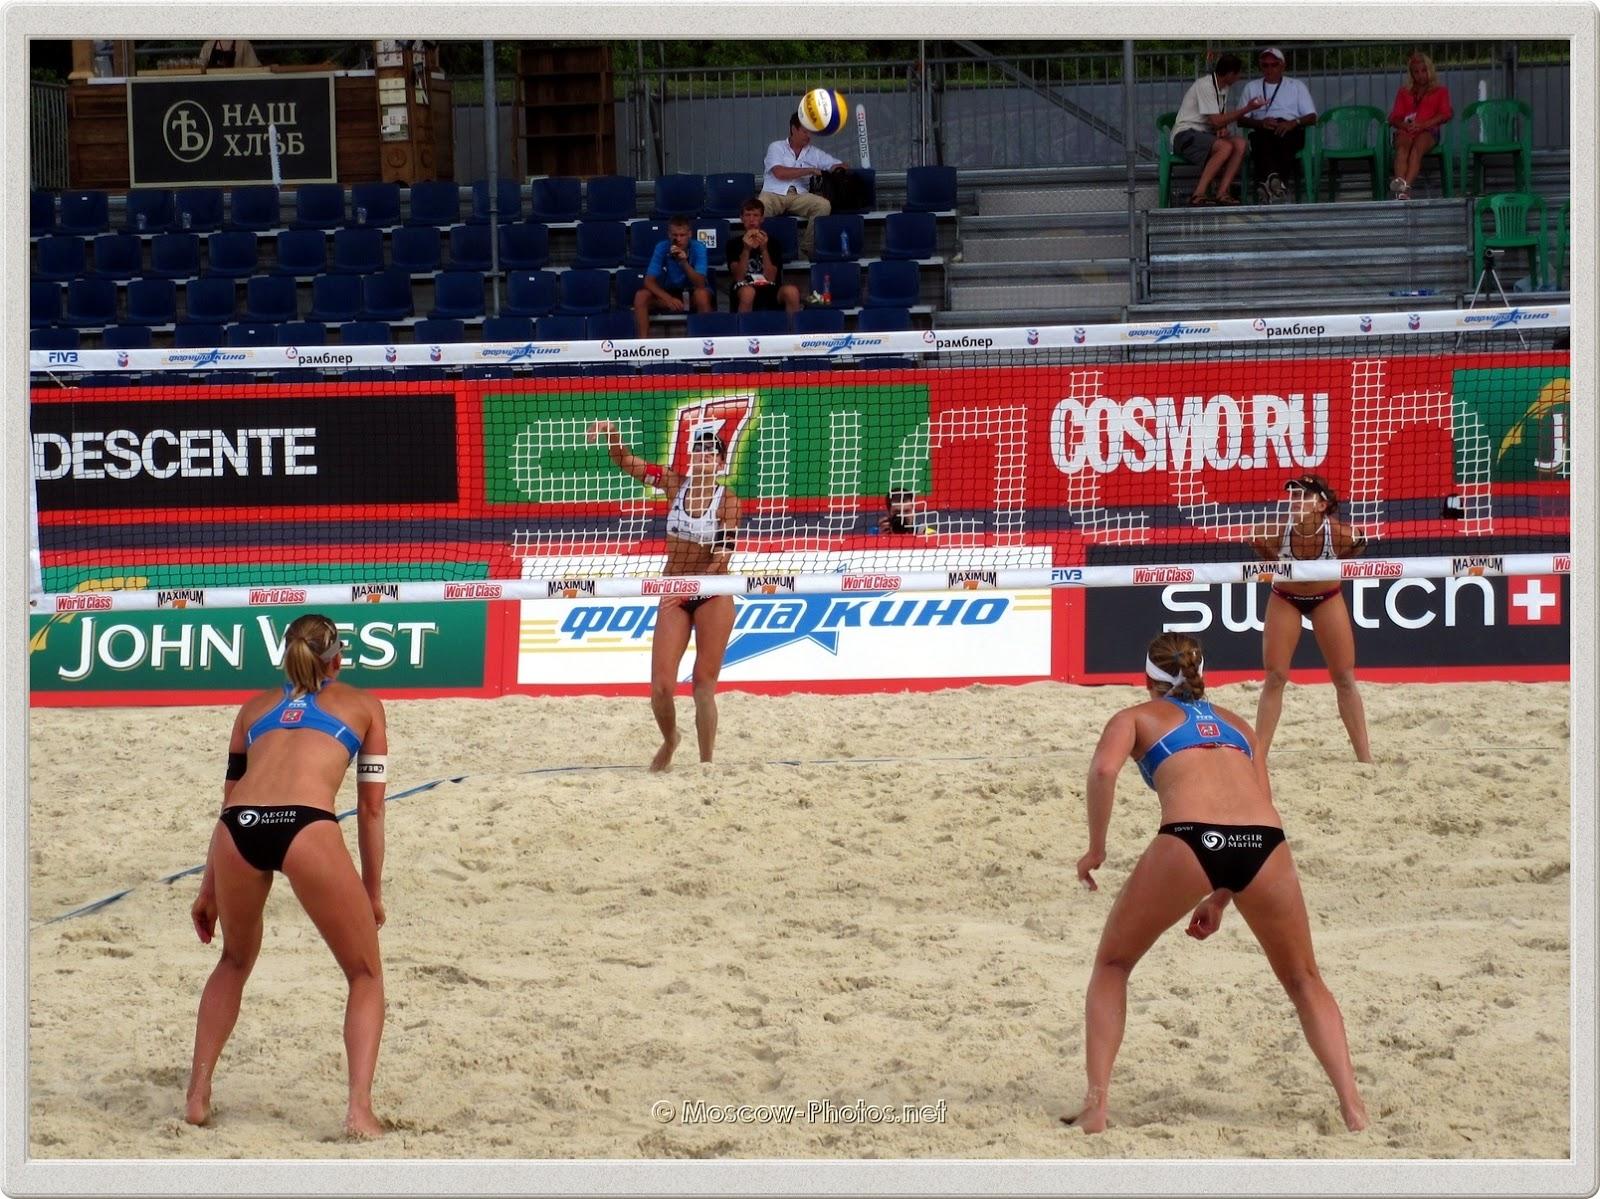 Defense of Dutch Women's Beach Volleyball Team